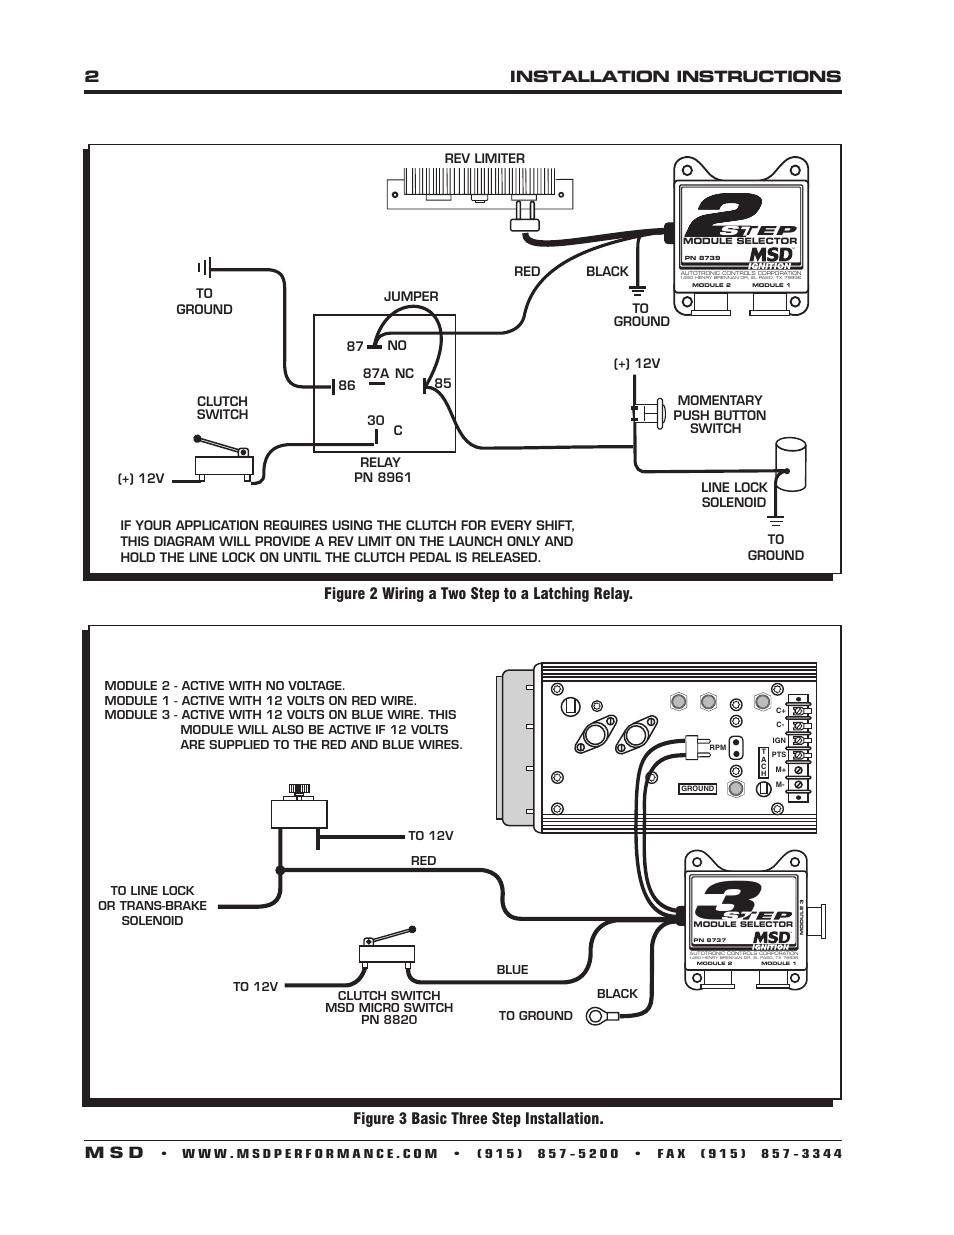 Msd Rpm Switch Wiring Diagram 2installation Instructions M S D Figure 3 Basic Three